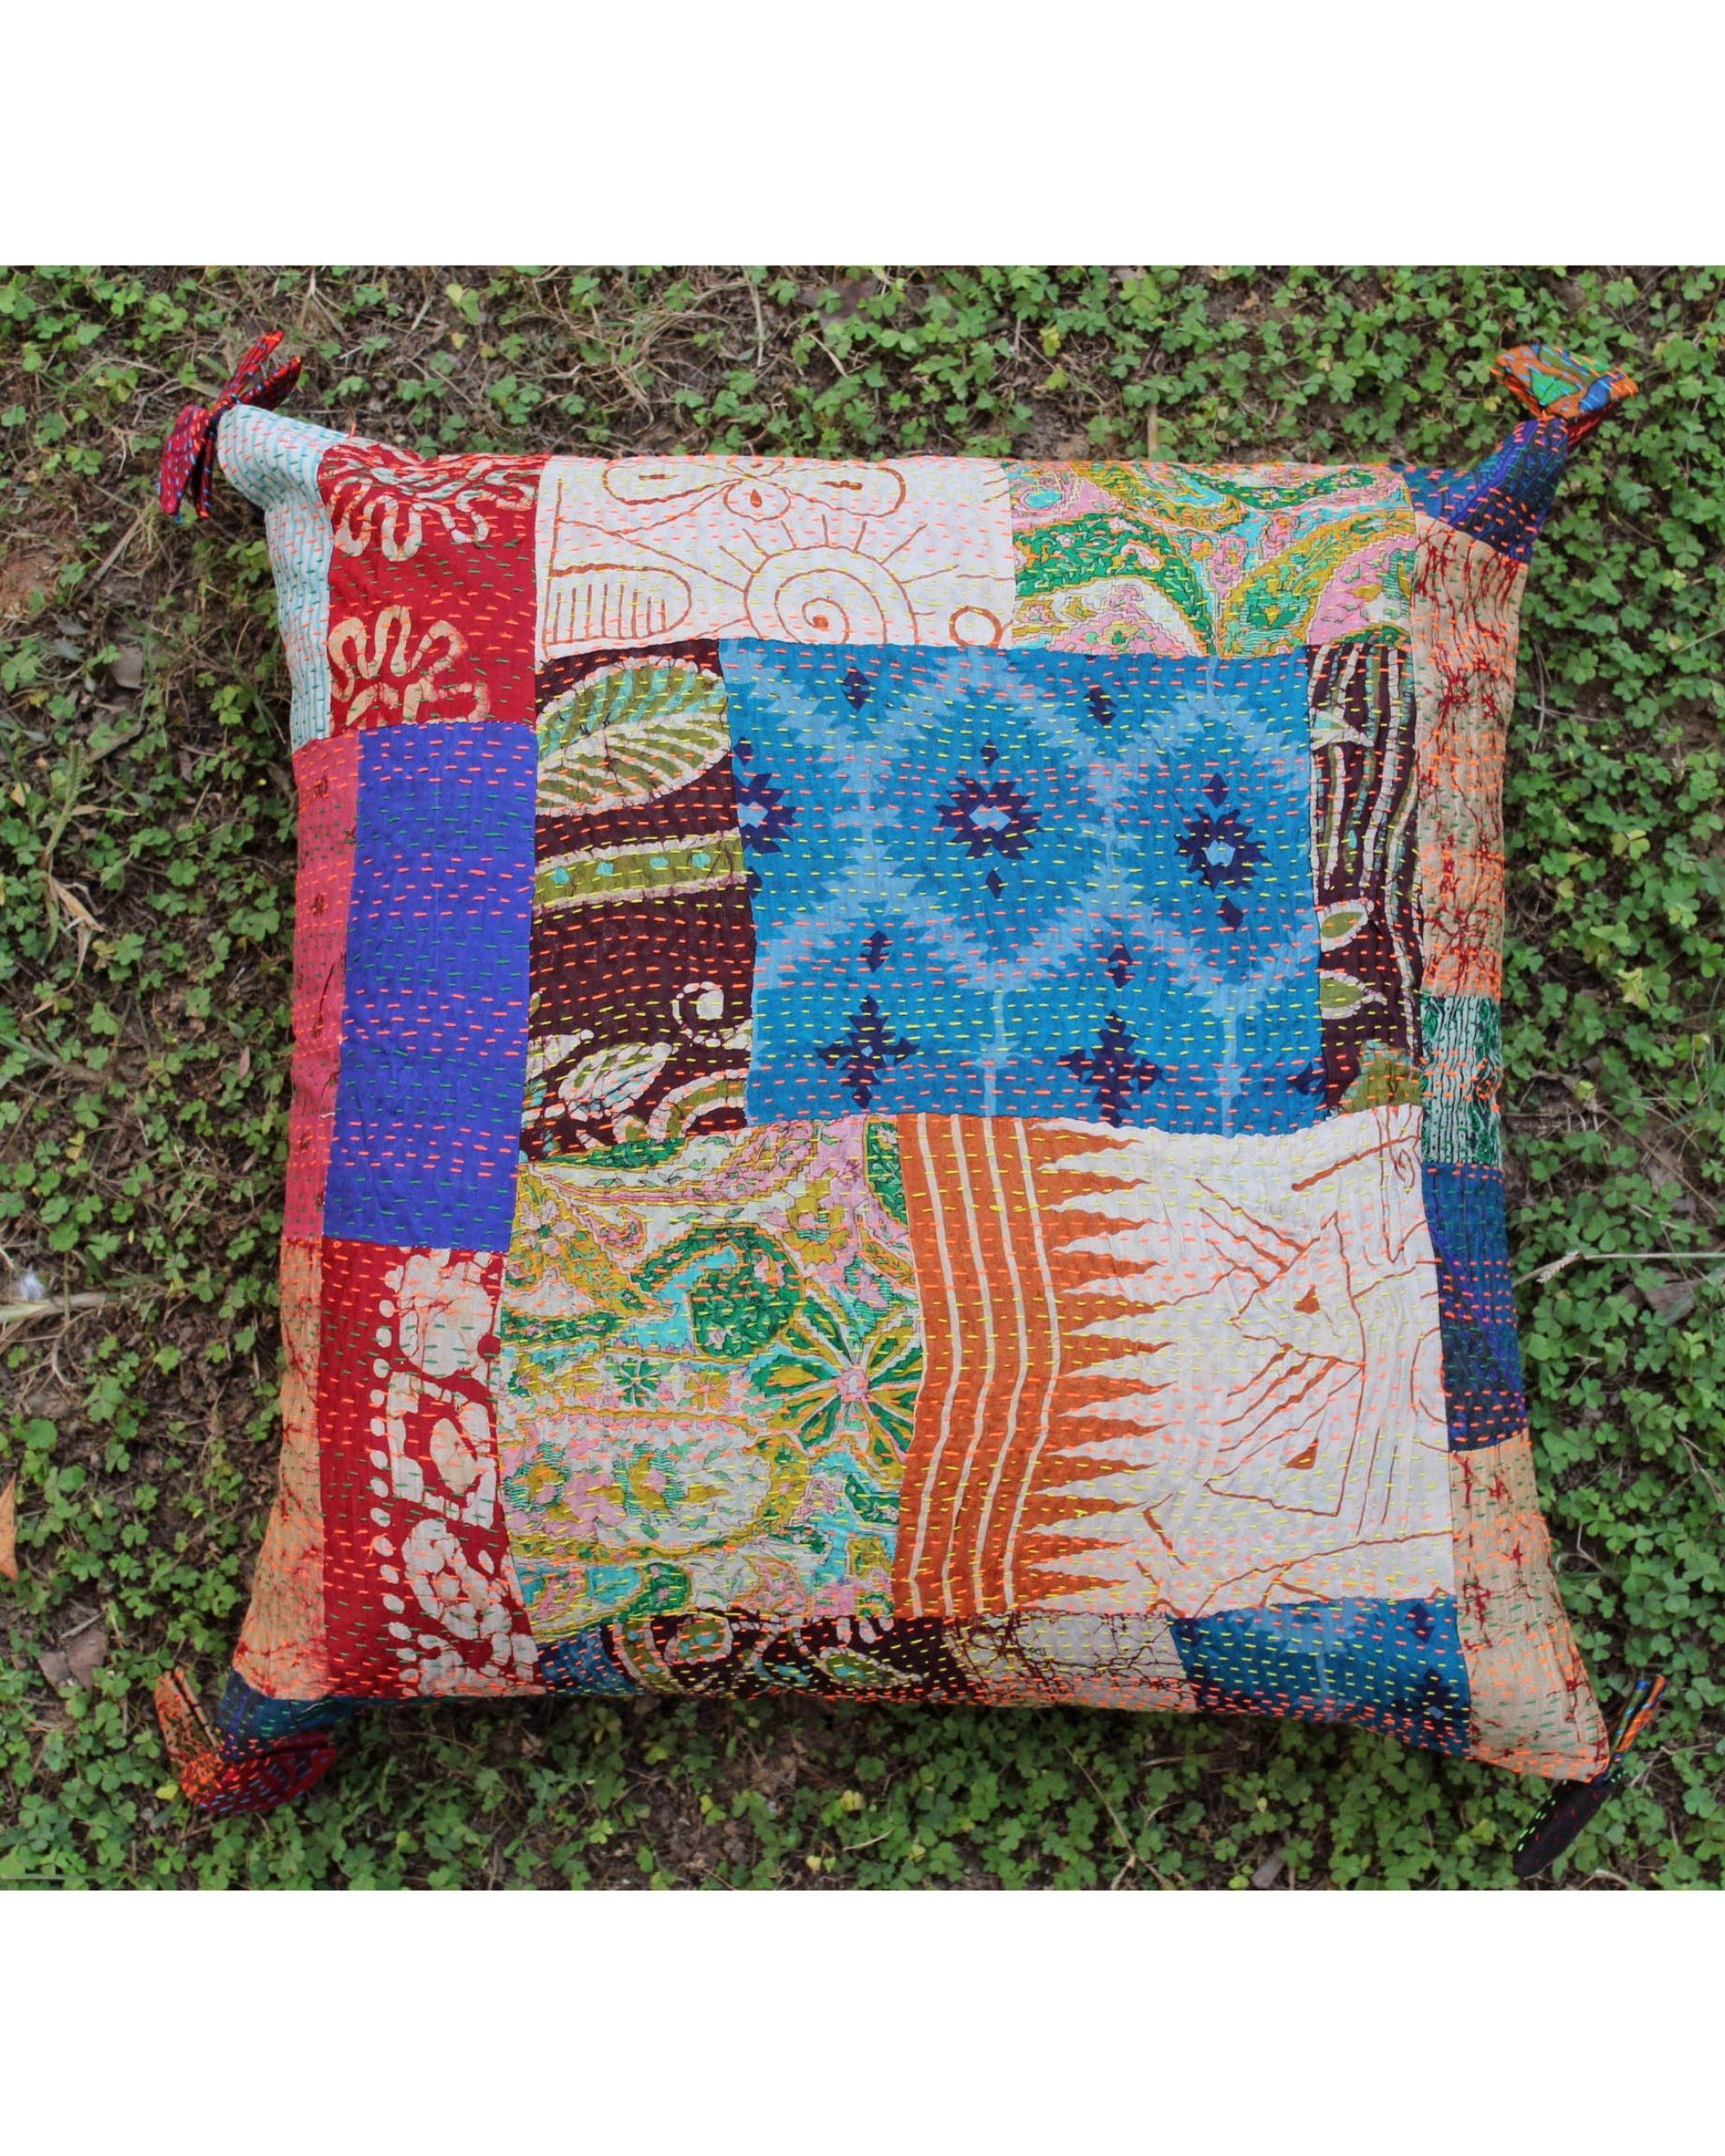 Vintage silk kantha cushion cover - large